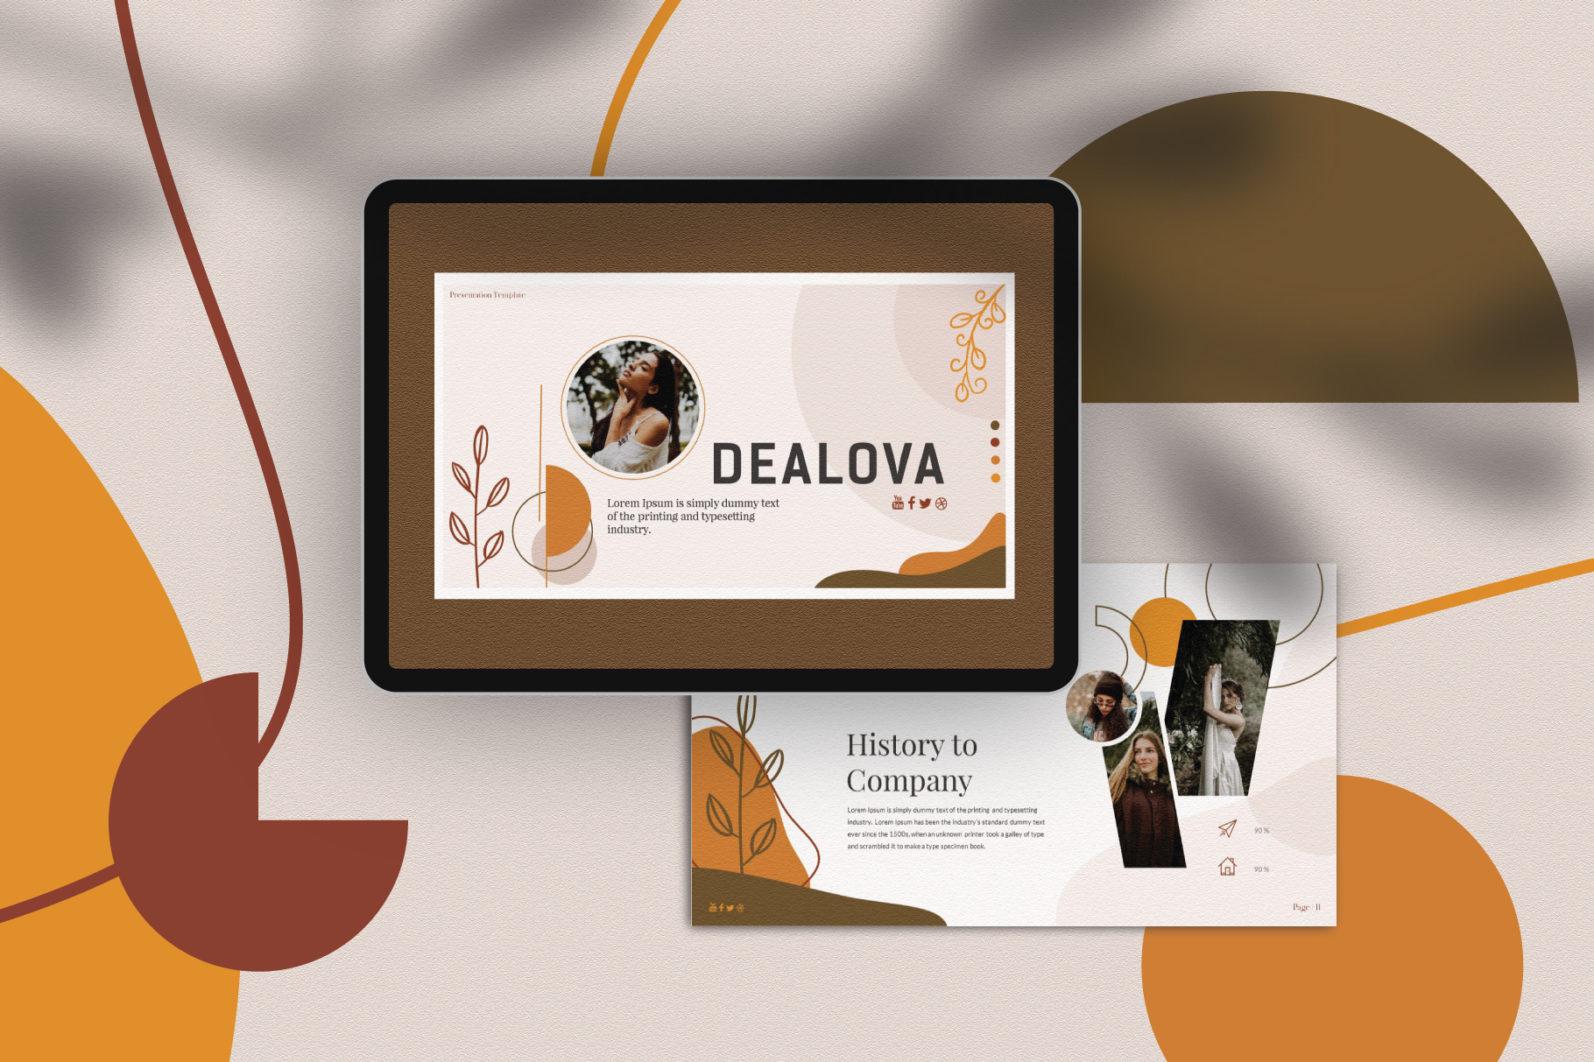 Dealova Keynote Template - PW 01c -